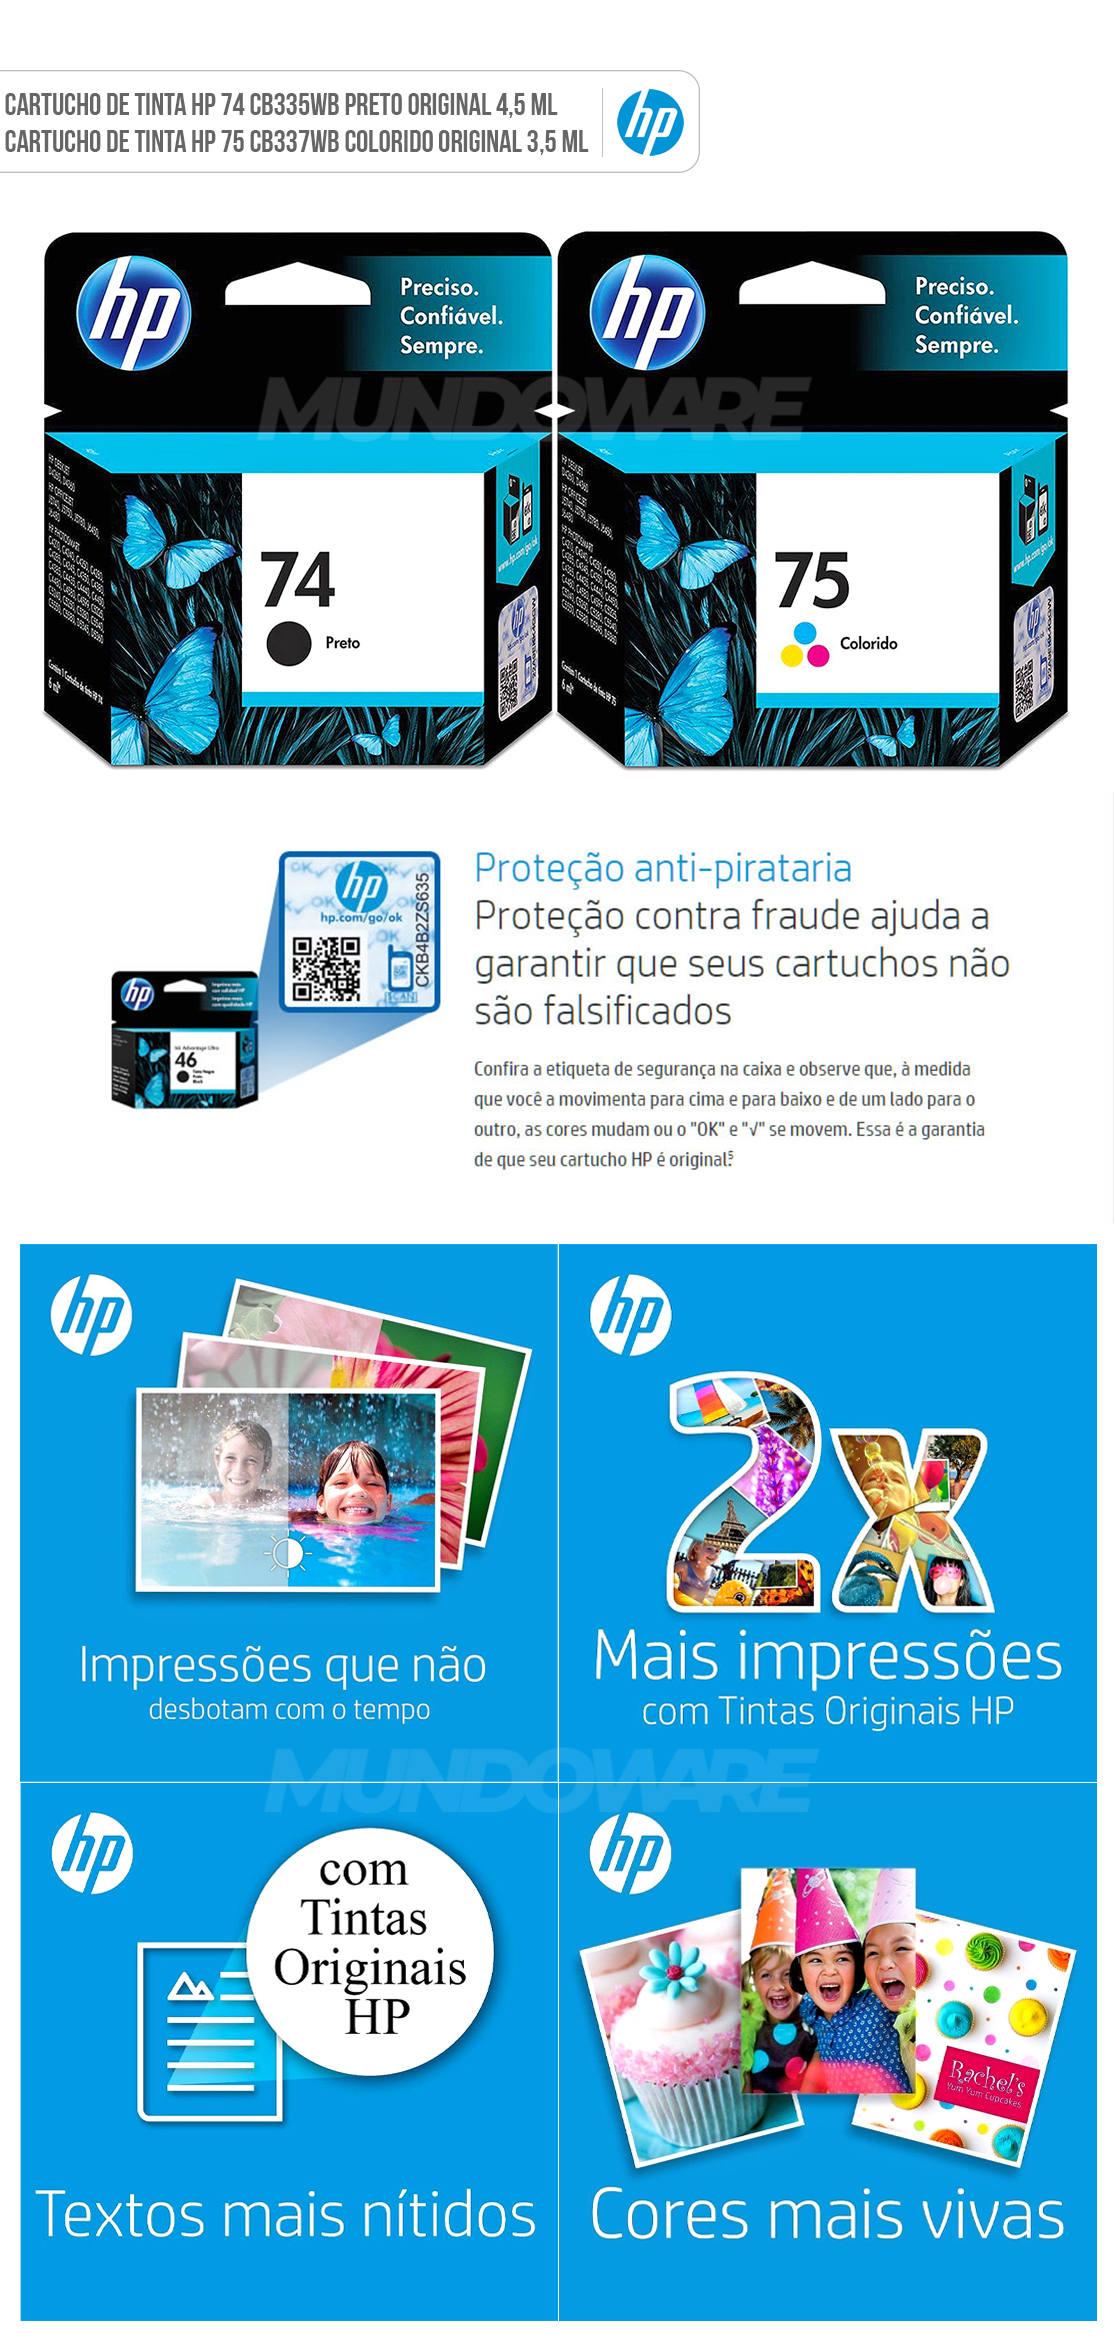 Kit Cartucho de Tinta HP 74 Preto + 75 Colorido para HP Deskjet D4260 D4360 Photosmart C4280 C4480 C5280 C4424 C4440 C4524 Officejet J6400 J6424 Original